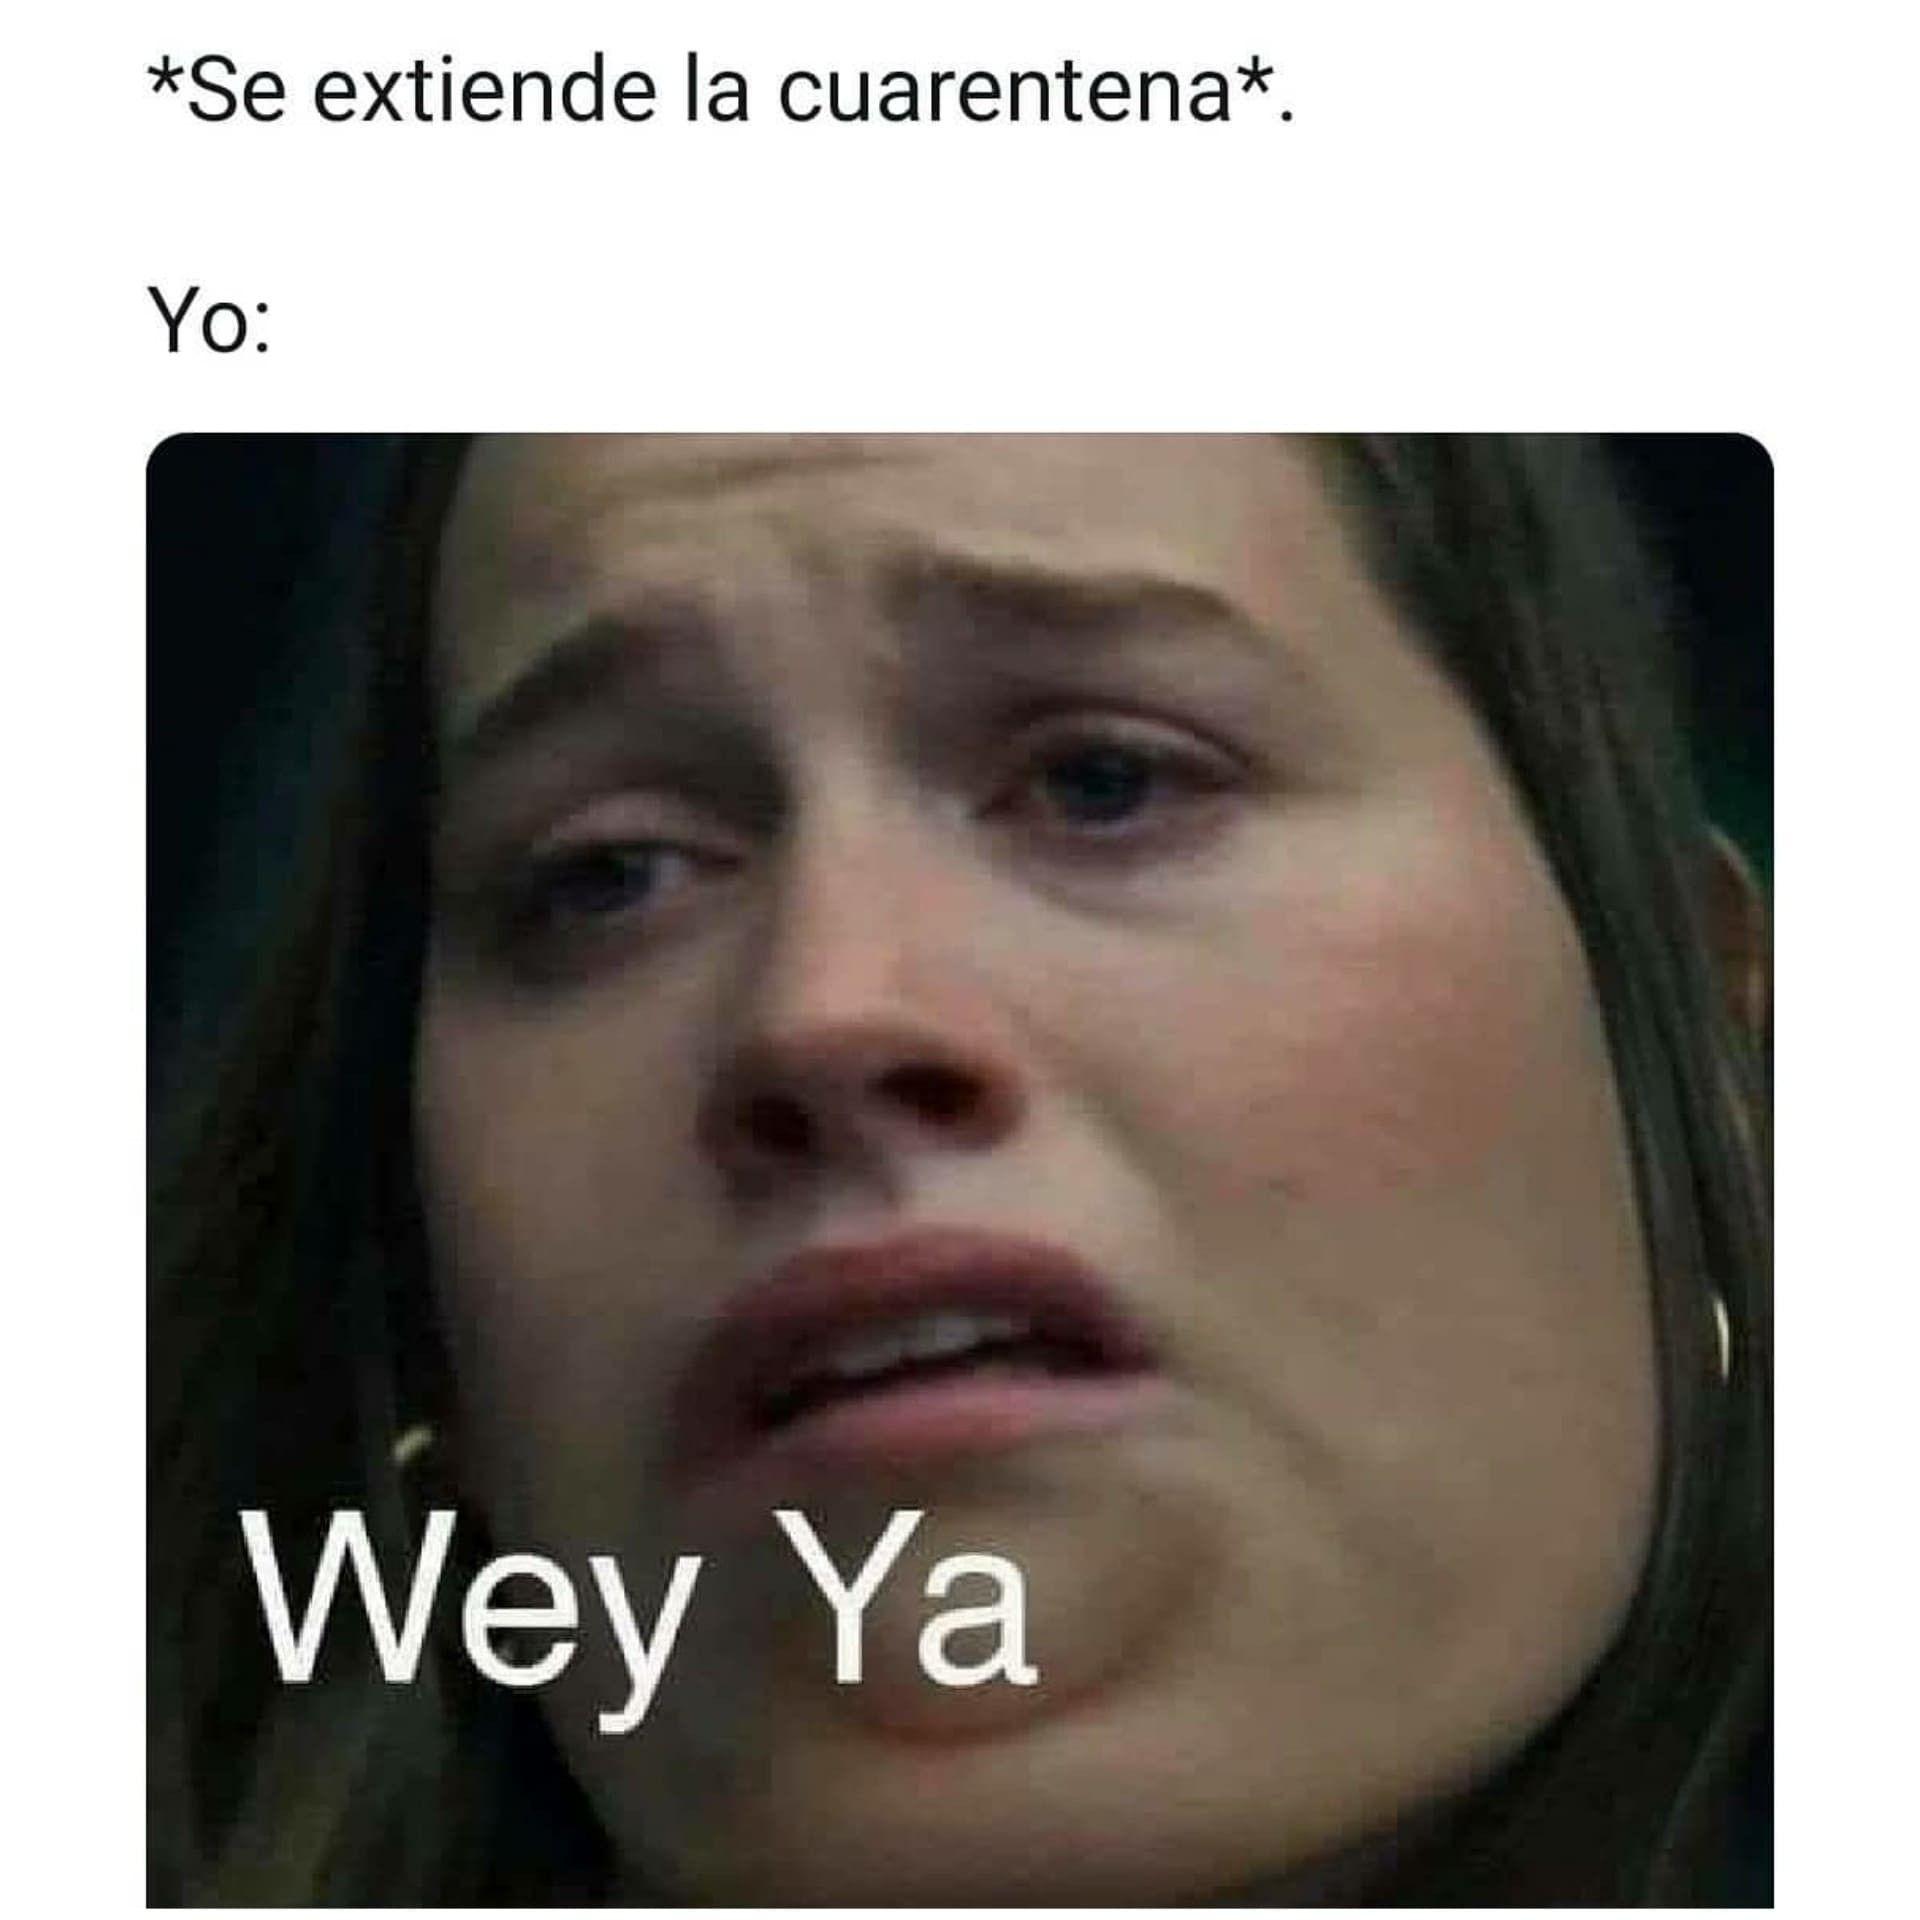 Memes De Parejas En Cuarentena